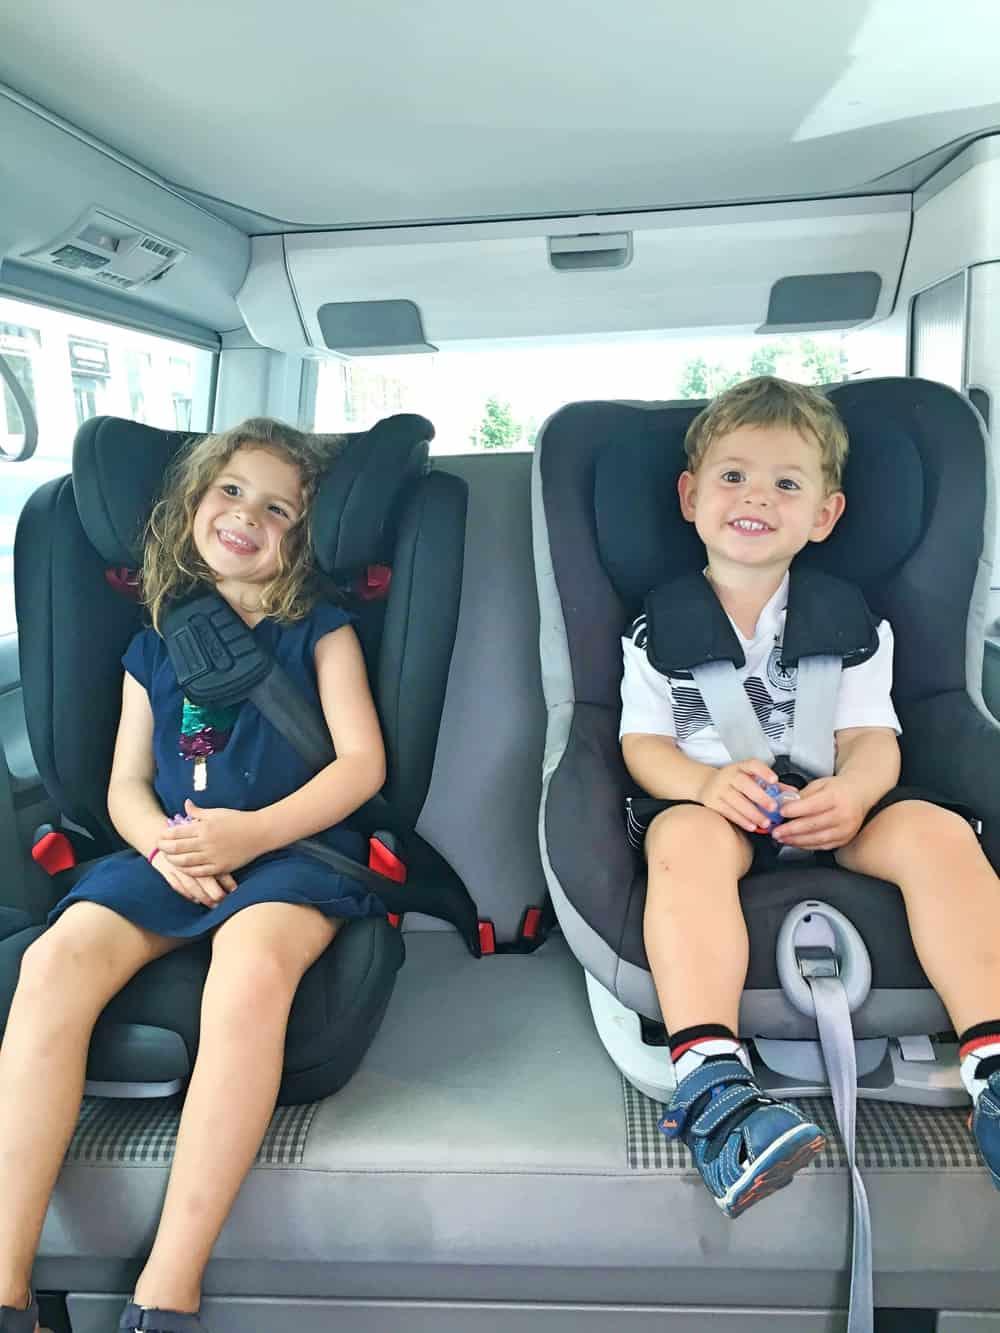 BLOG – LONG CAR RIDES WITH KIDS